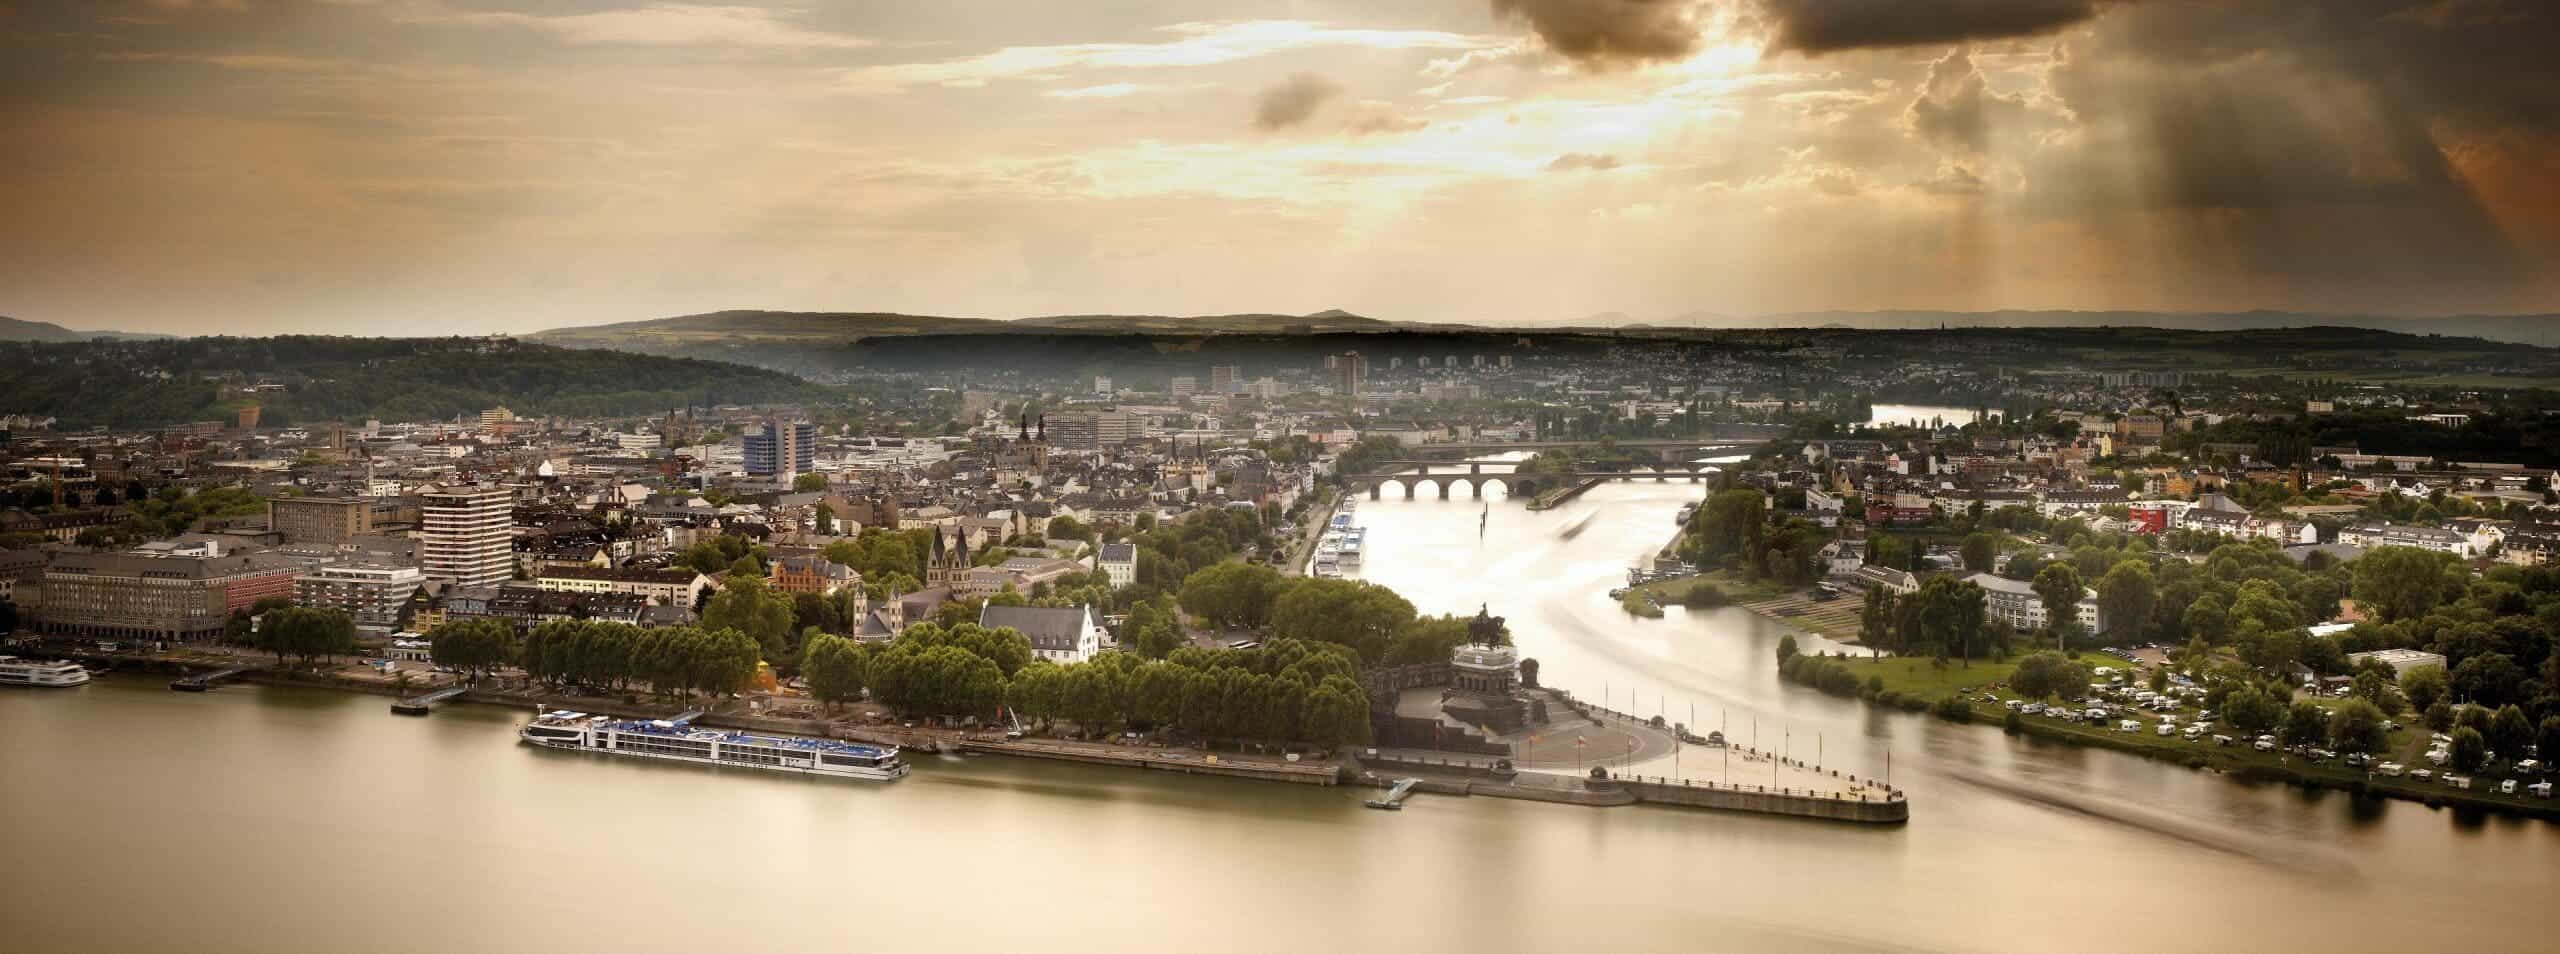 Koblenz-scaled-neu-1